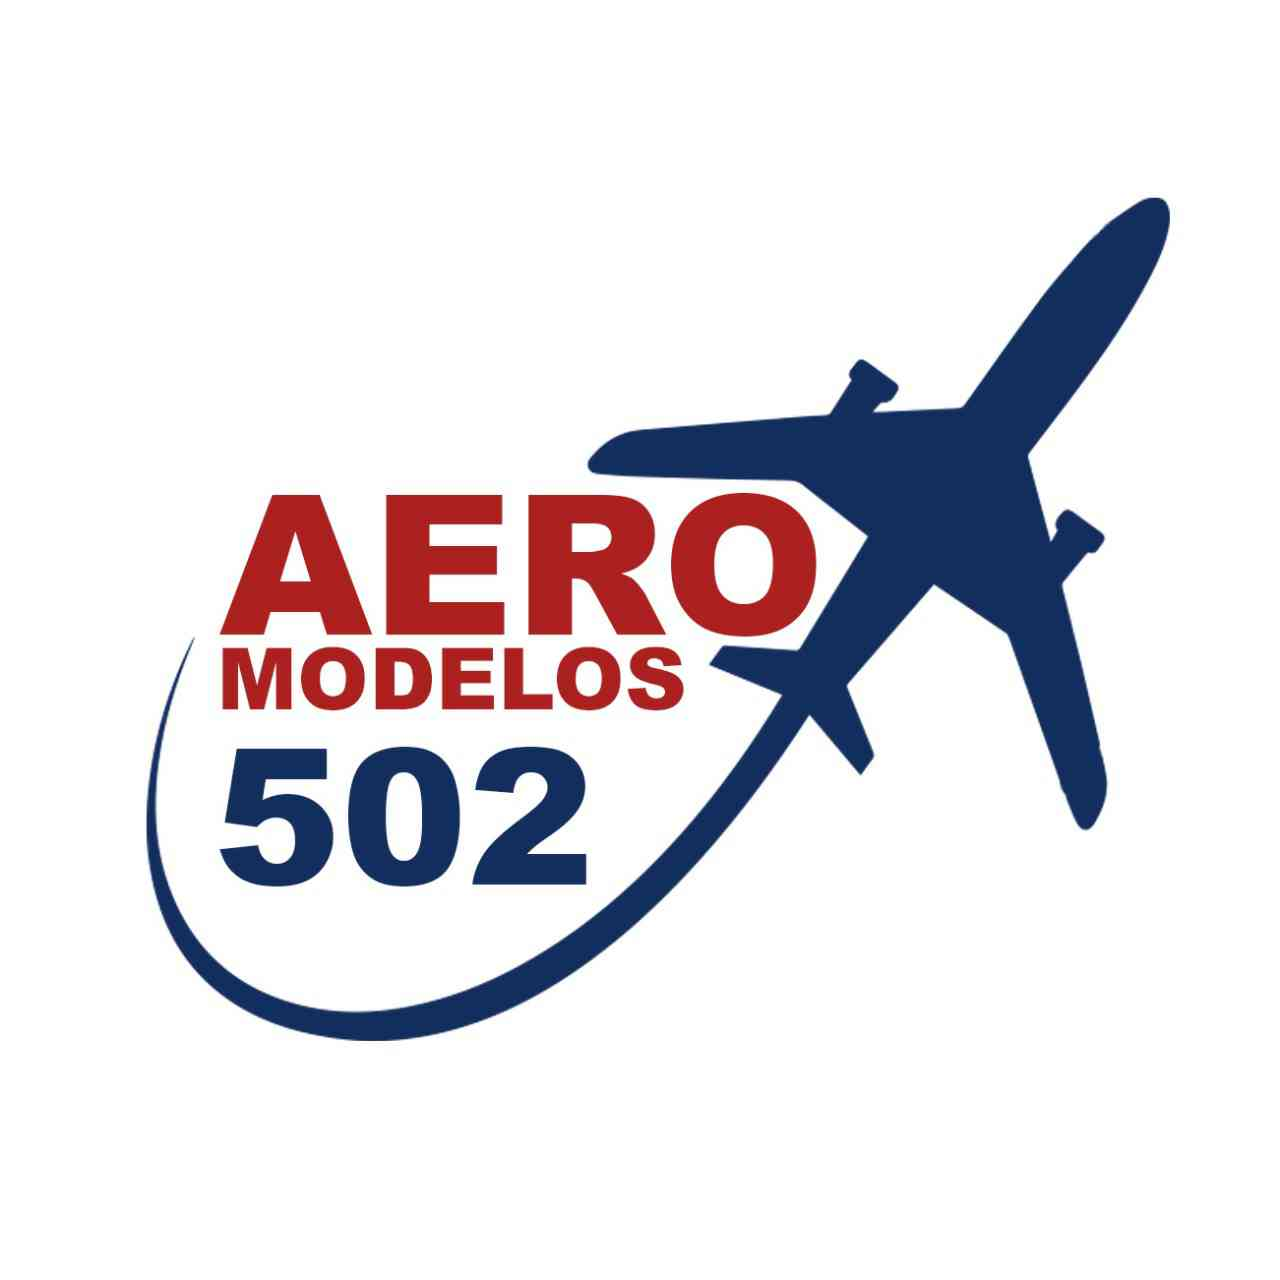 AEROMODELOS502